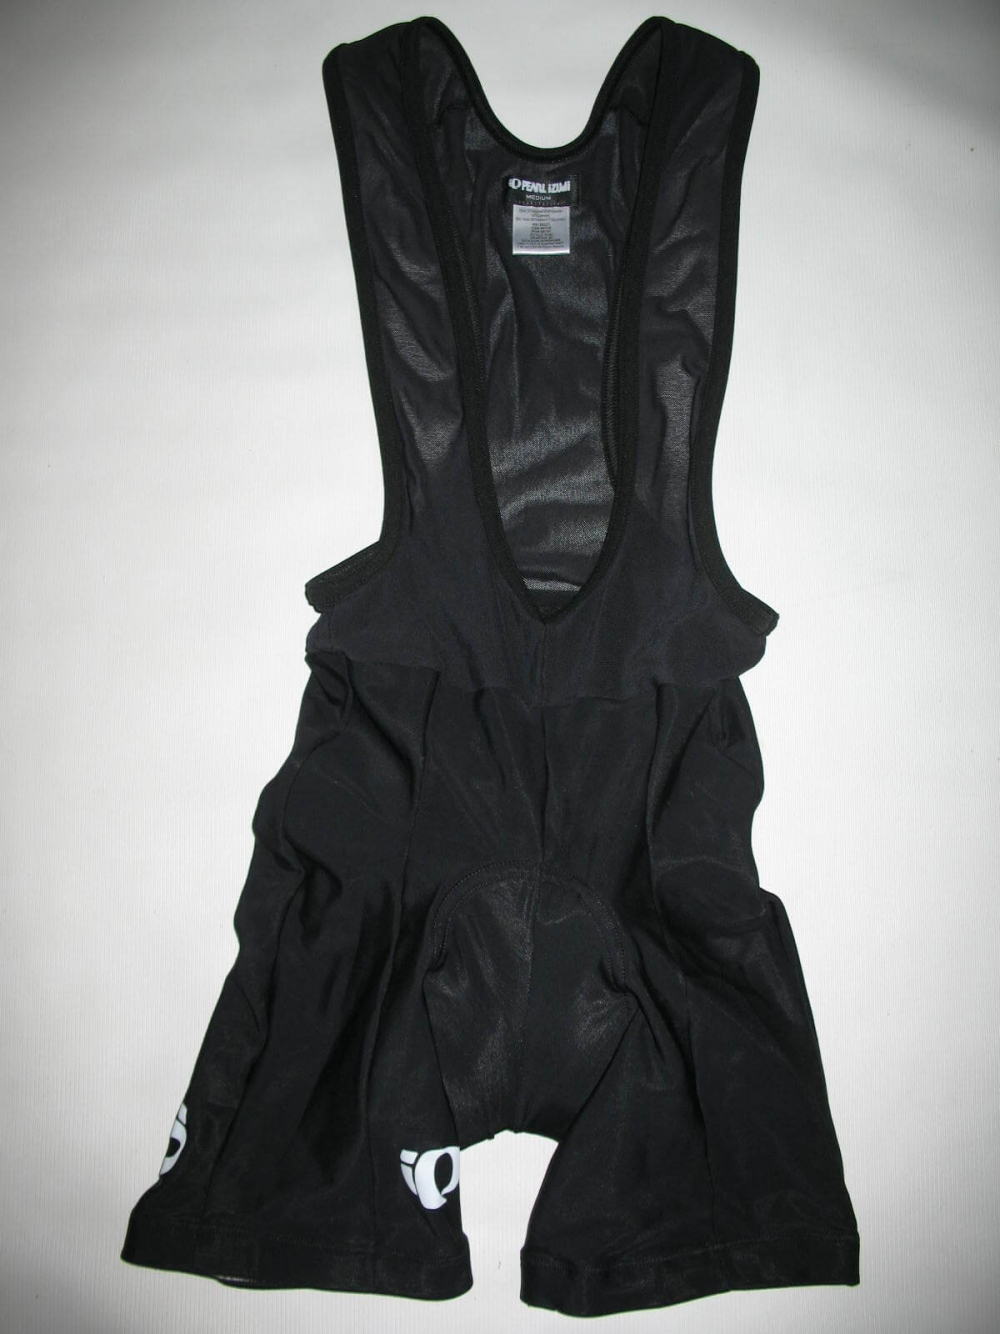 Велошорты PEARL IZUMI bib shorts (размер М/S) - 2